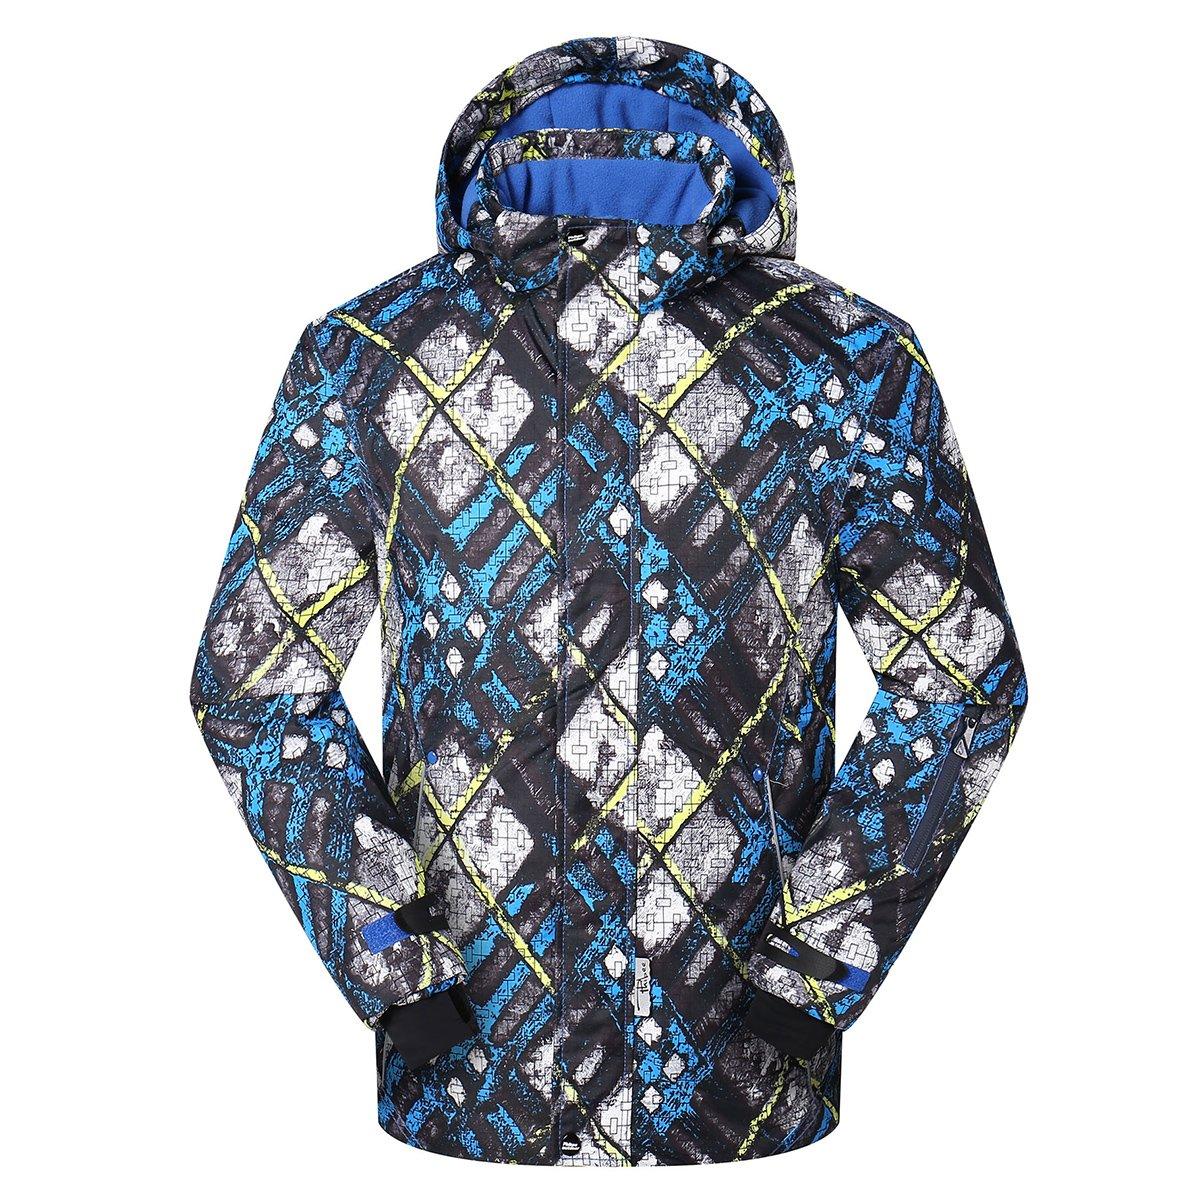 PHIBEE Big Boy's Waterproof Breathable Snowboard Ski Jacket Kangya